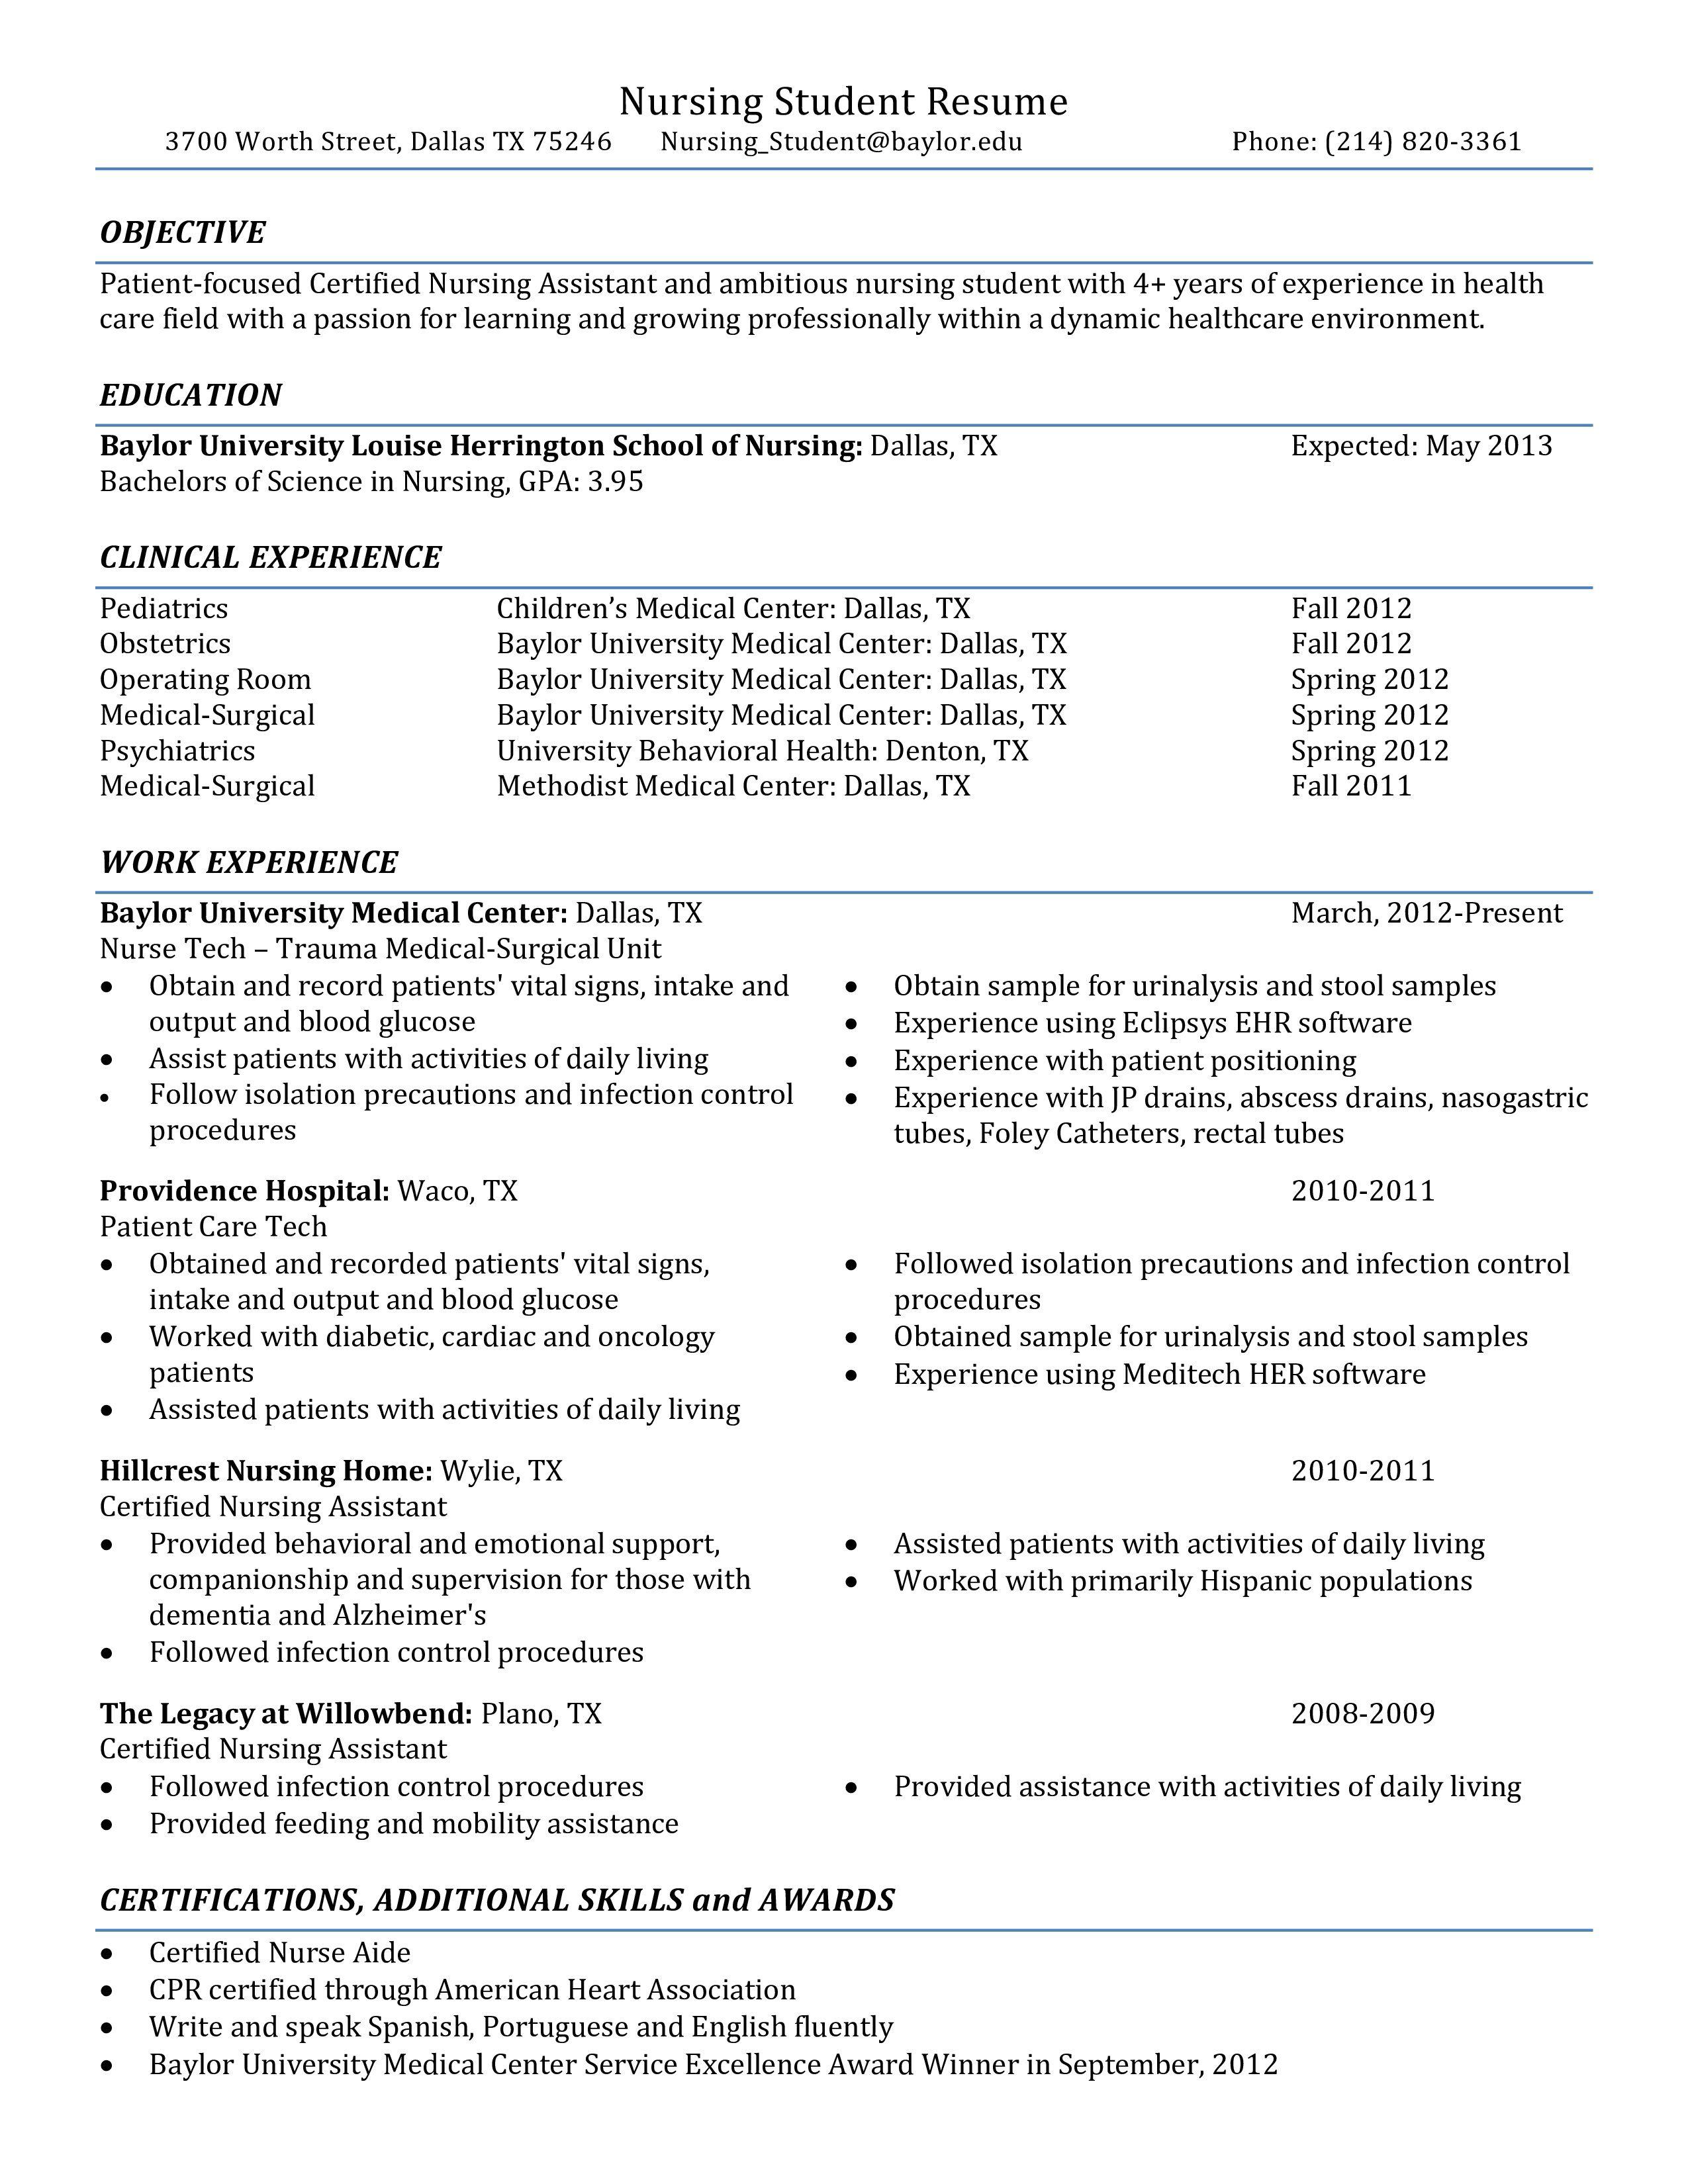 001 Rare Nursing Student Resume Template Example  Free WordFull